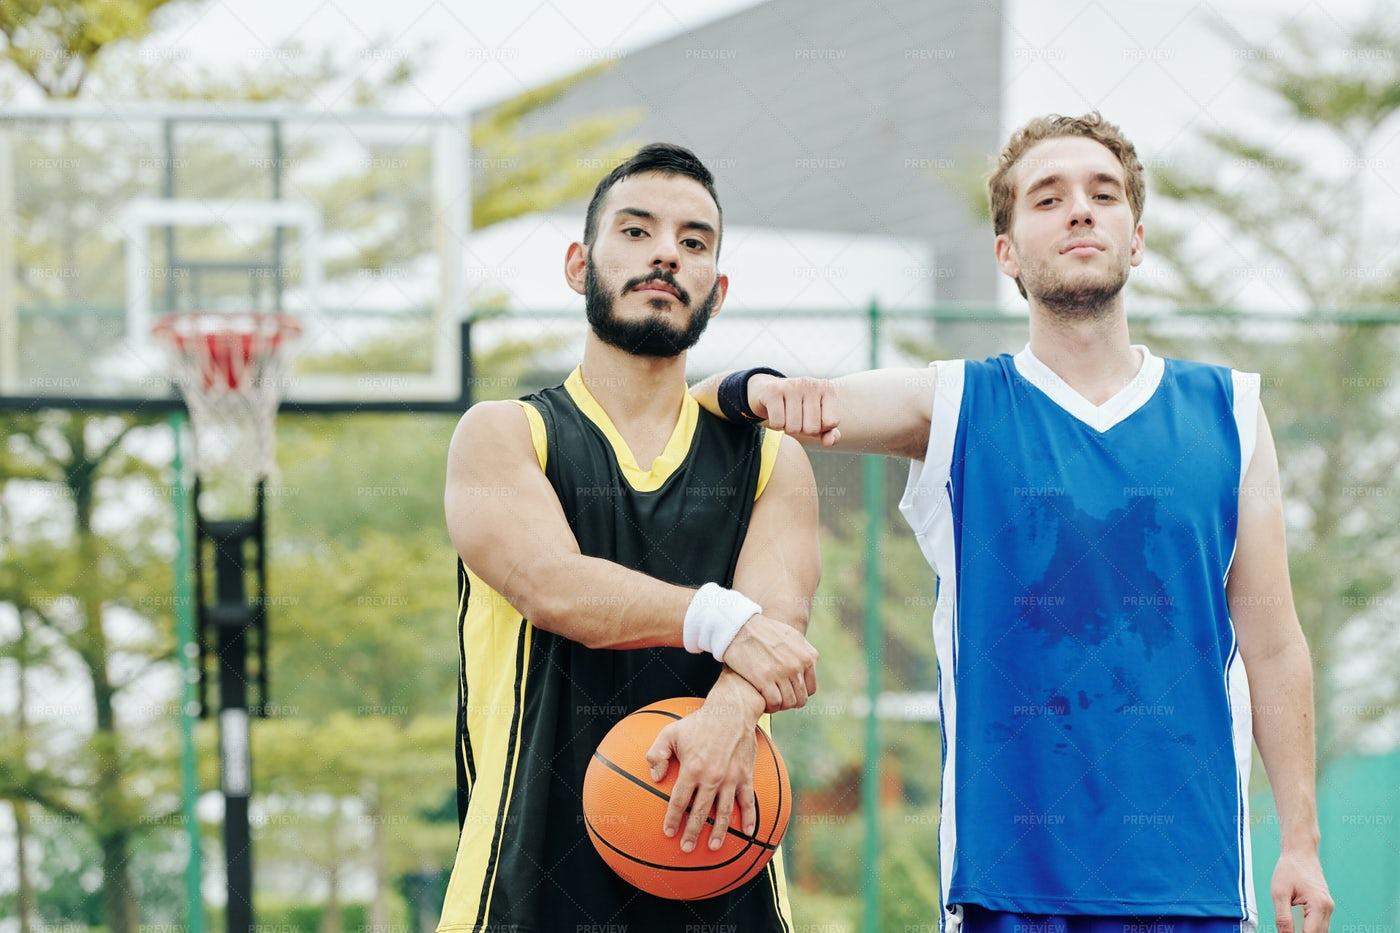 Sweaty Basketball Players: Stock Photos